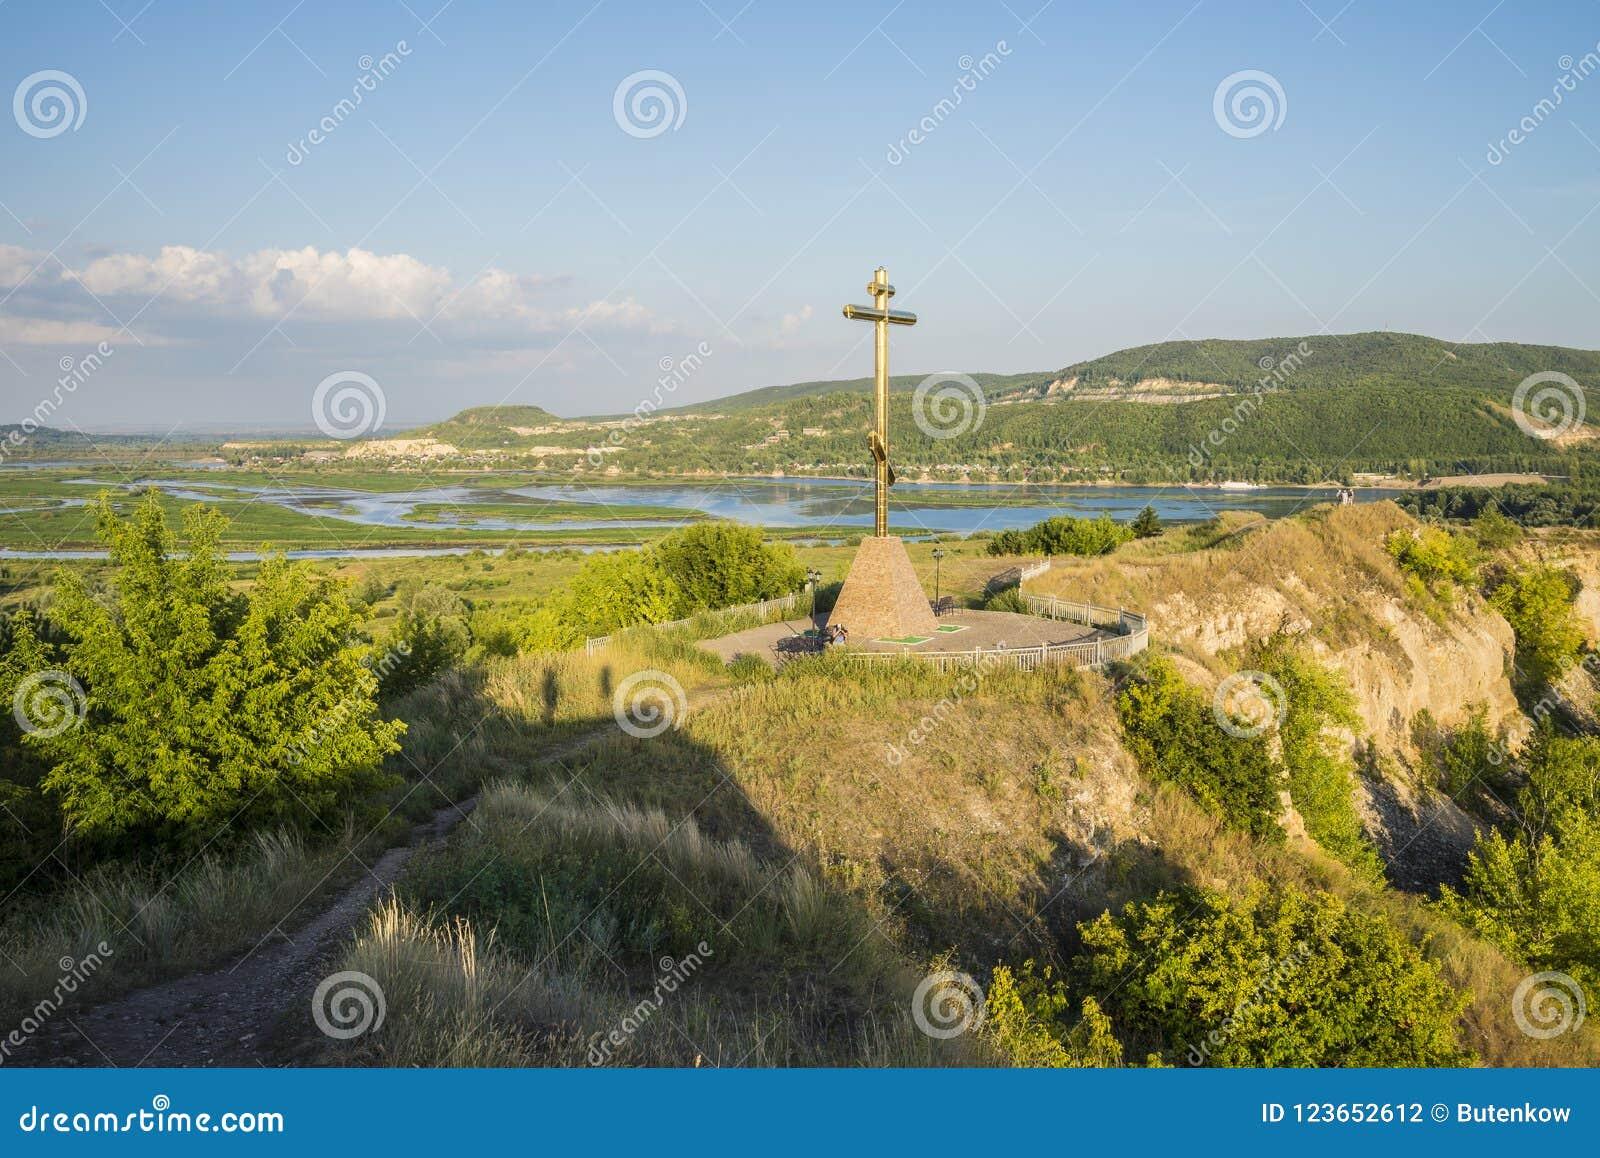 Tsarev Kurgan, Samara: description, location and interesting facts 19